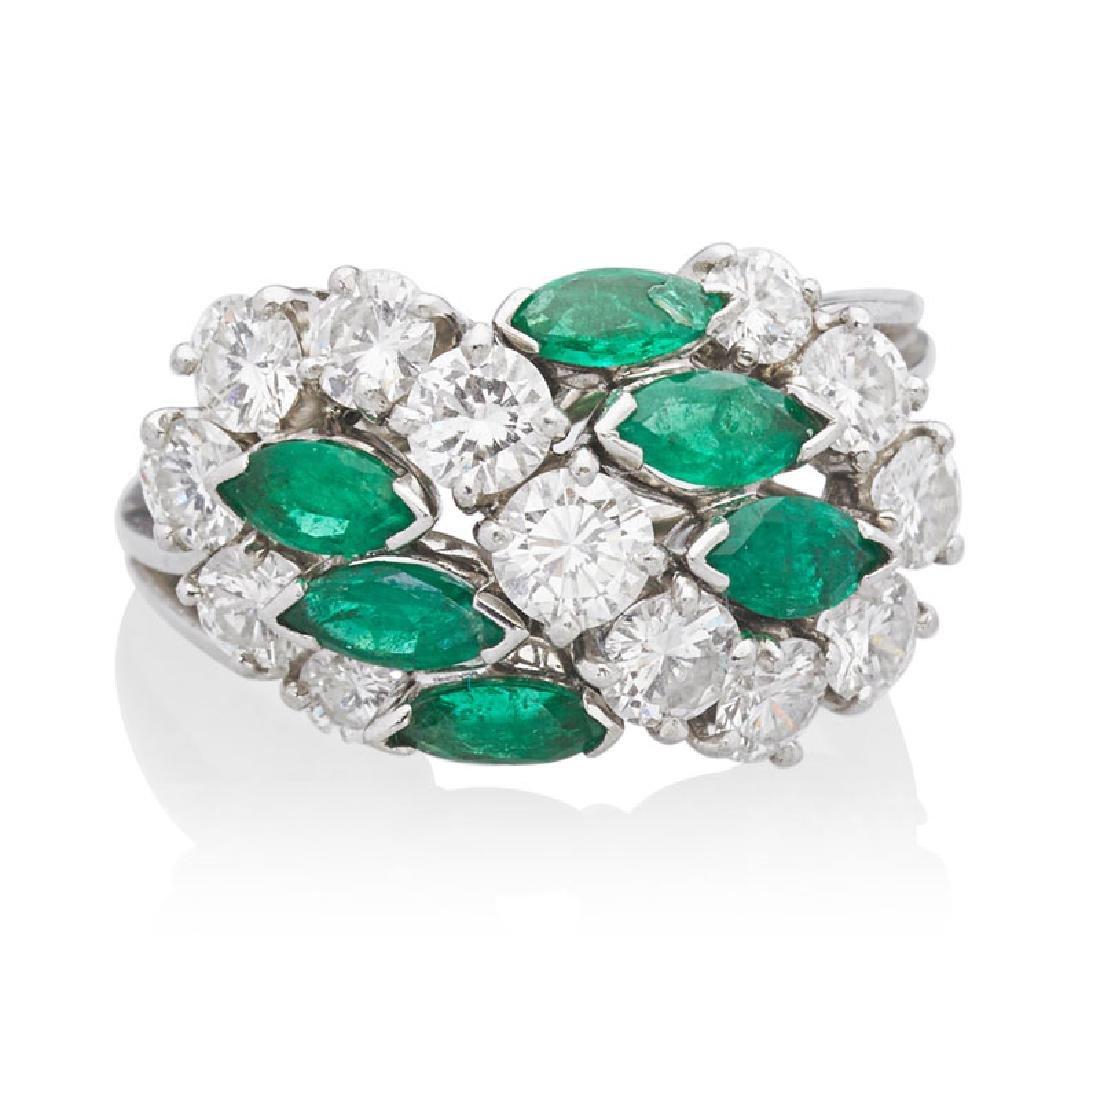 CARTIER DIAMOND, EMERALD & PLATINUM RING